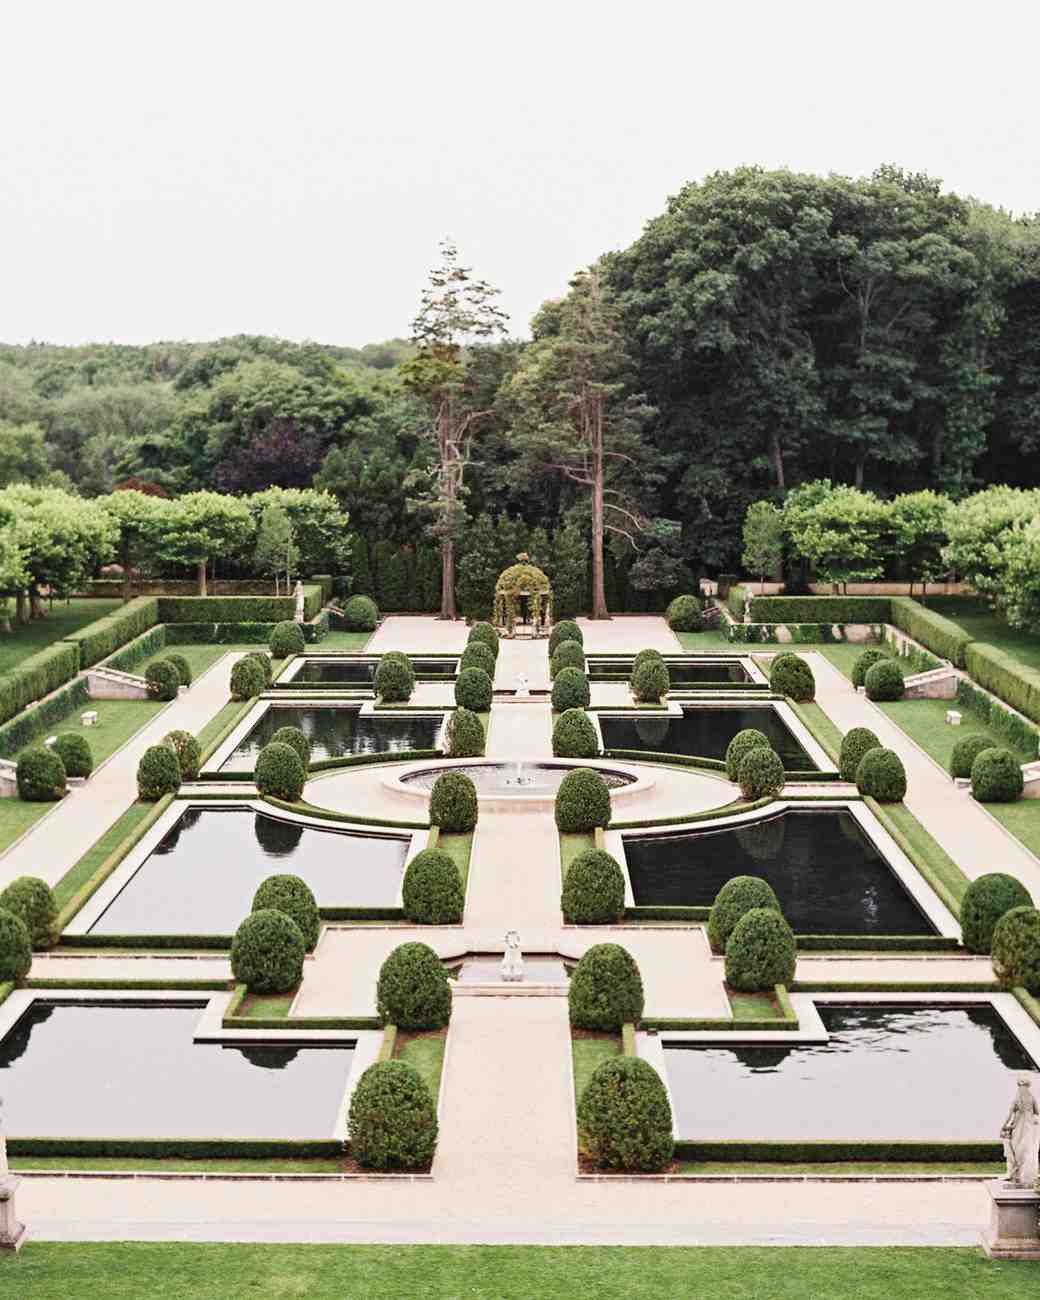 rebecca-david-wedding-new-york-oheka-castle-garden-d112241.jpg